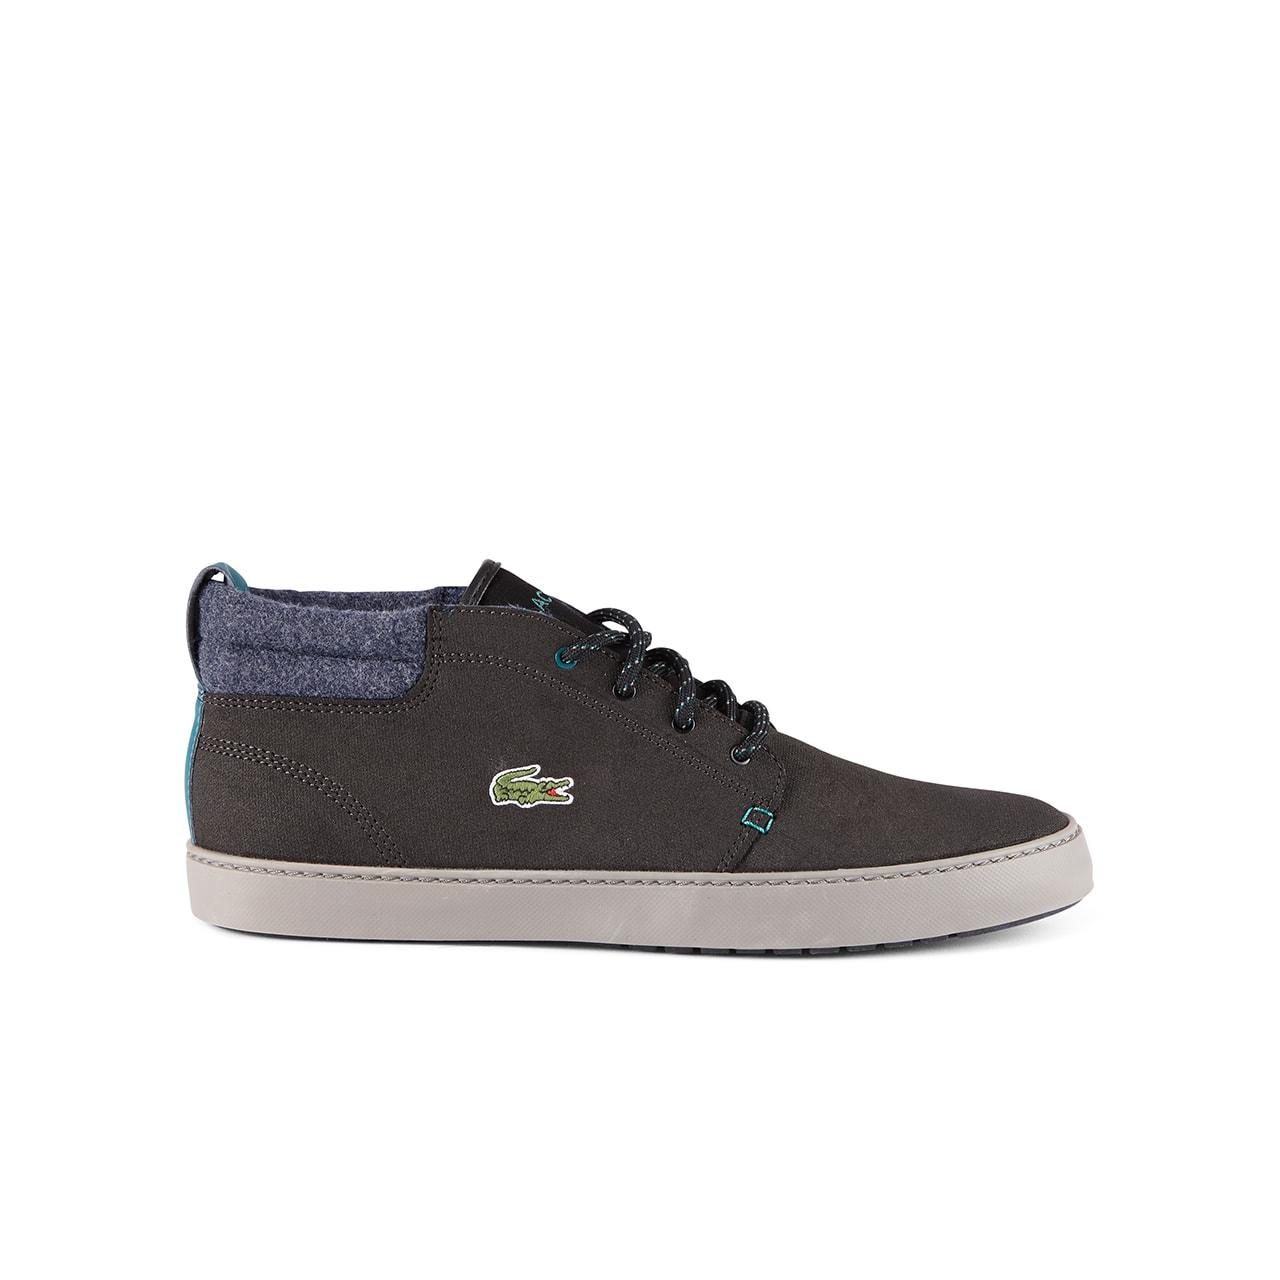 Men's Ampthill Terra Chukka Leather Sneakers